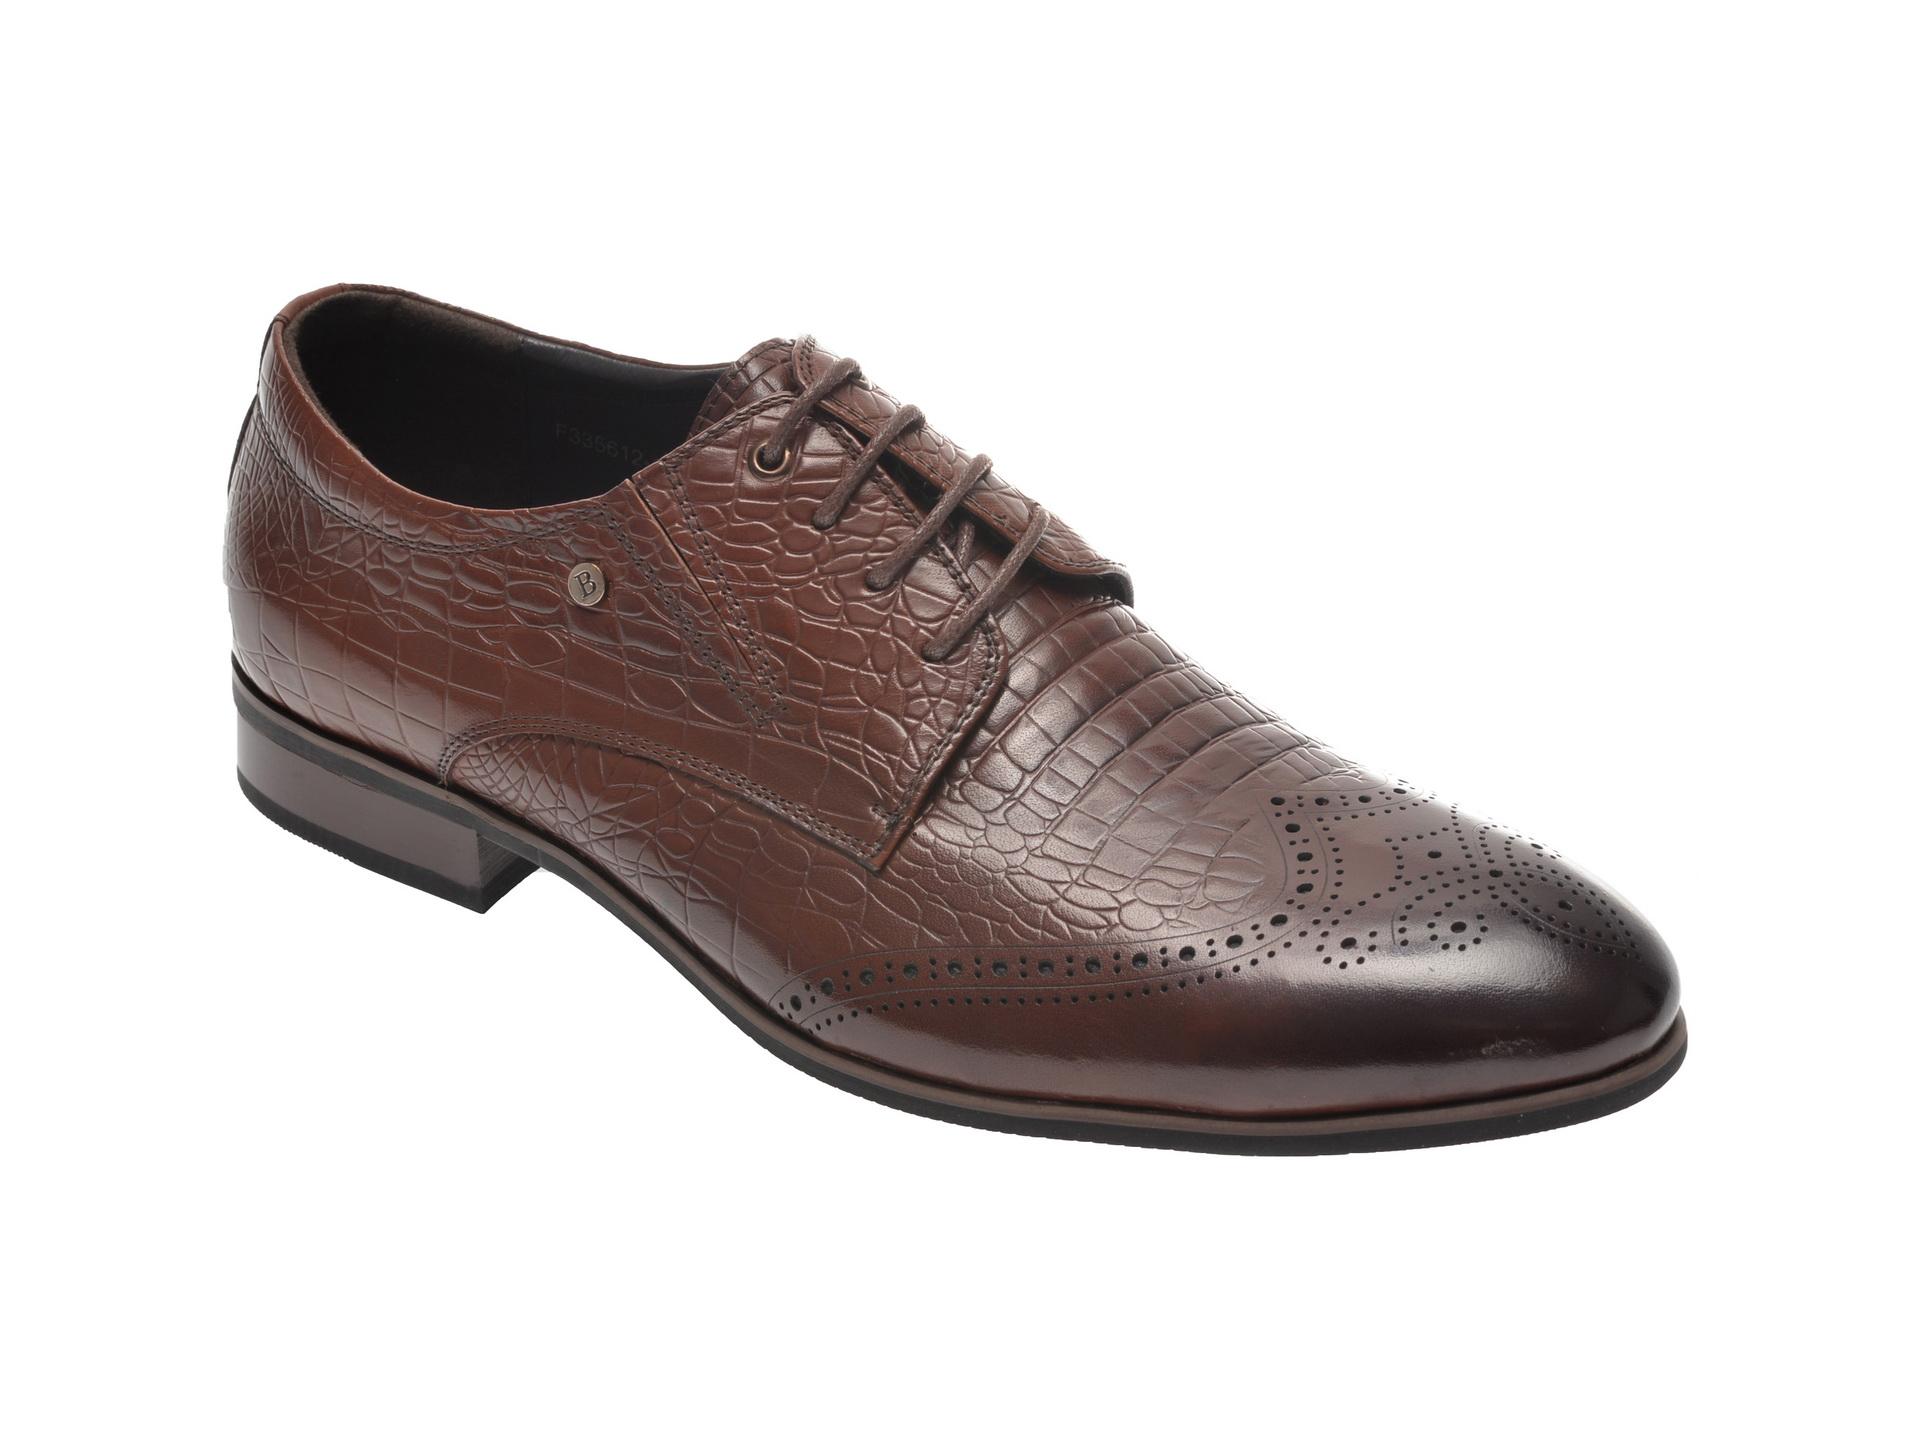 Pantofi OTTER maro, F335612, din piele naturala imagine